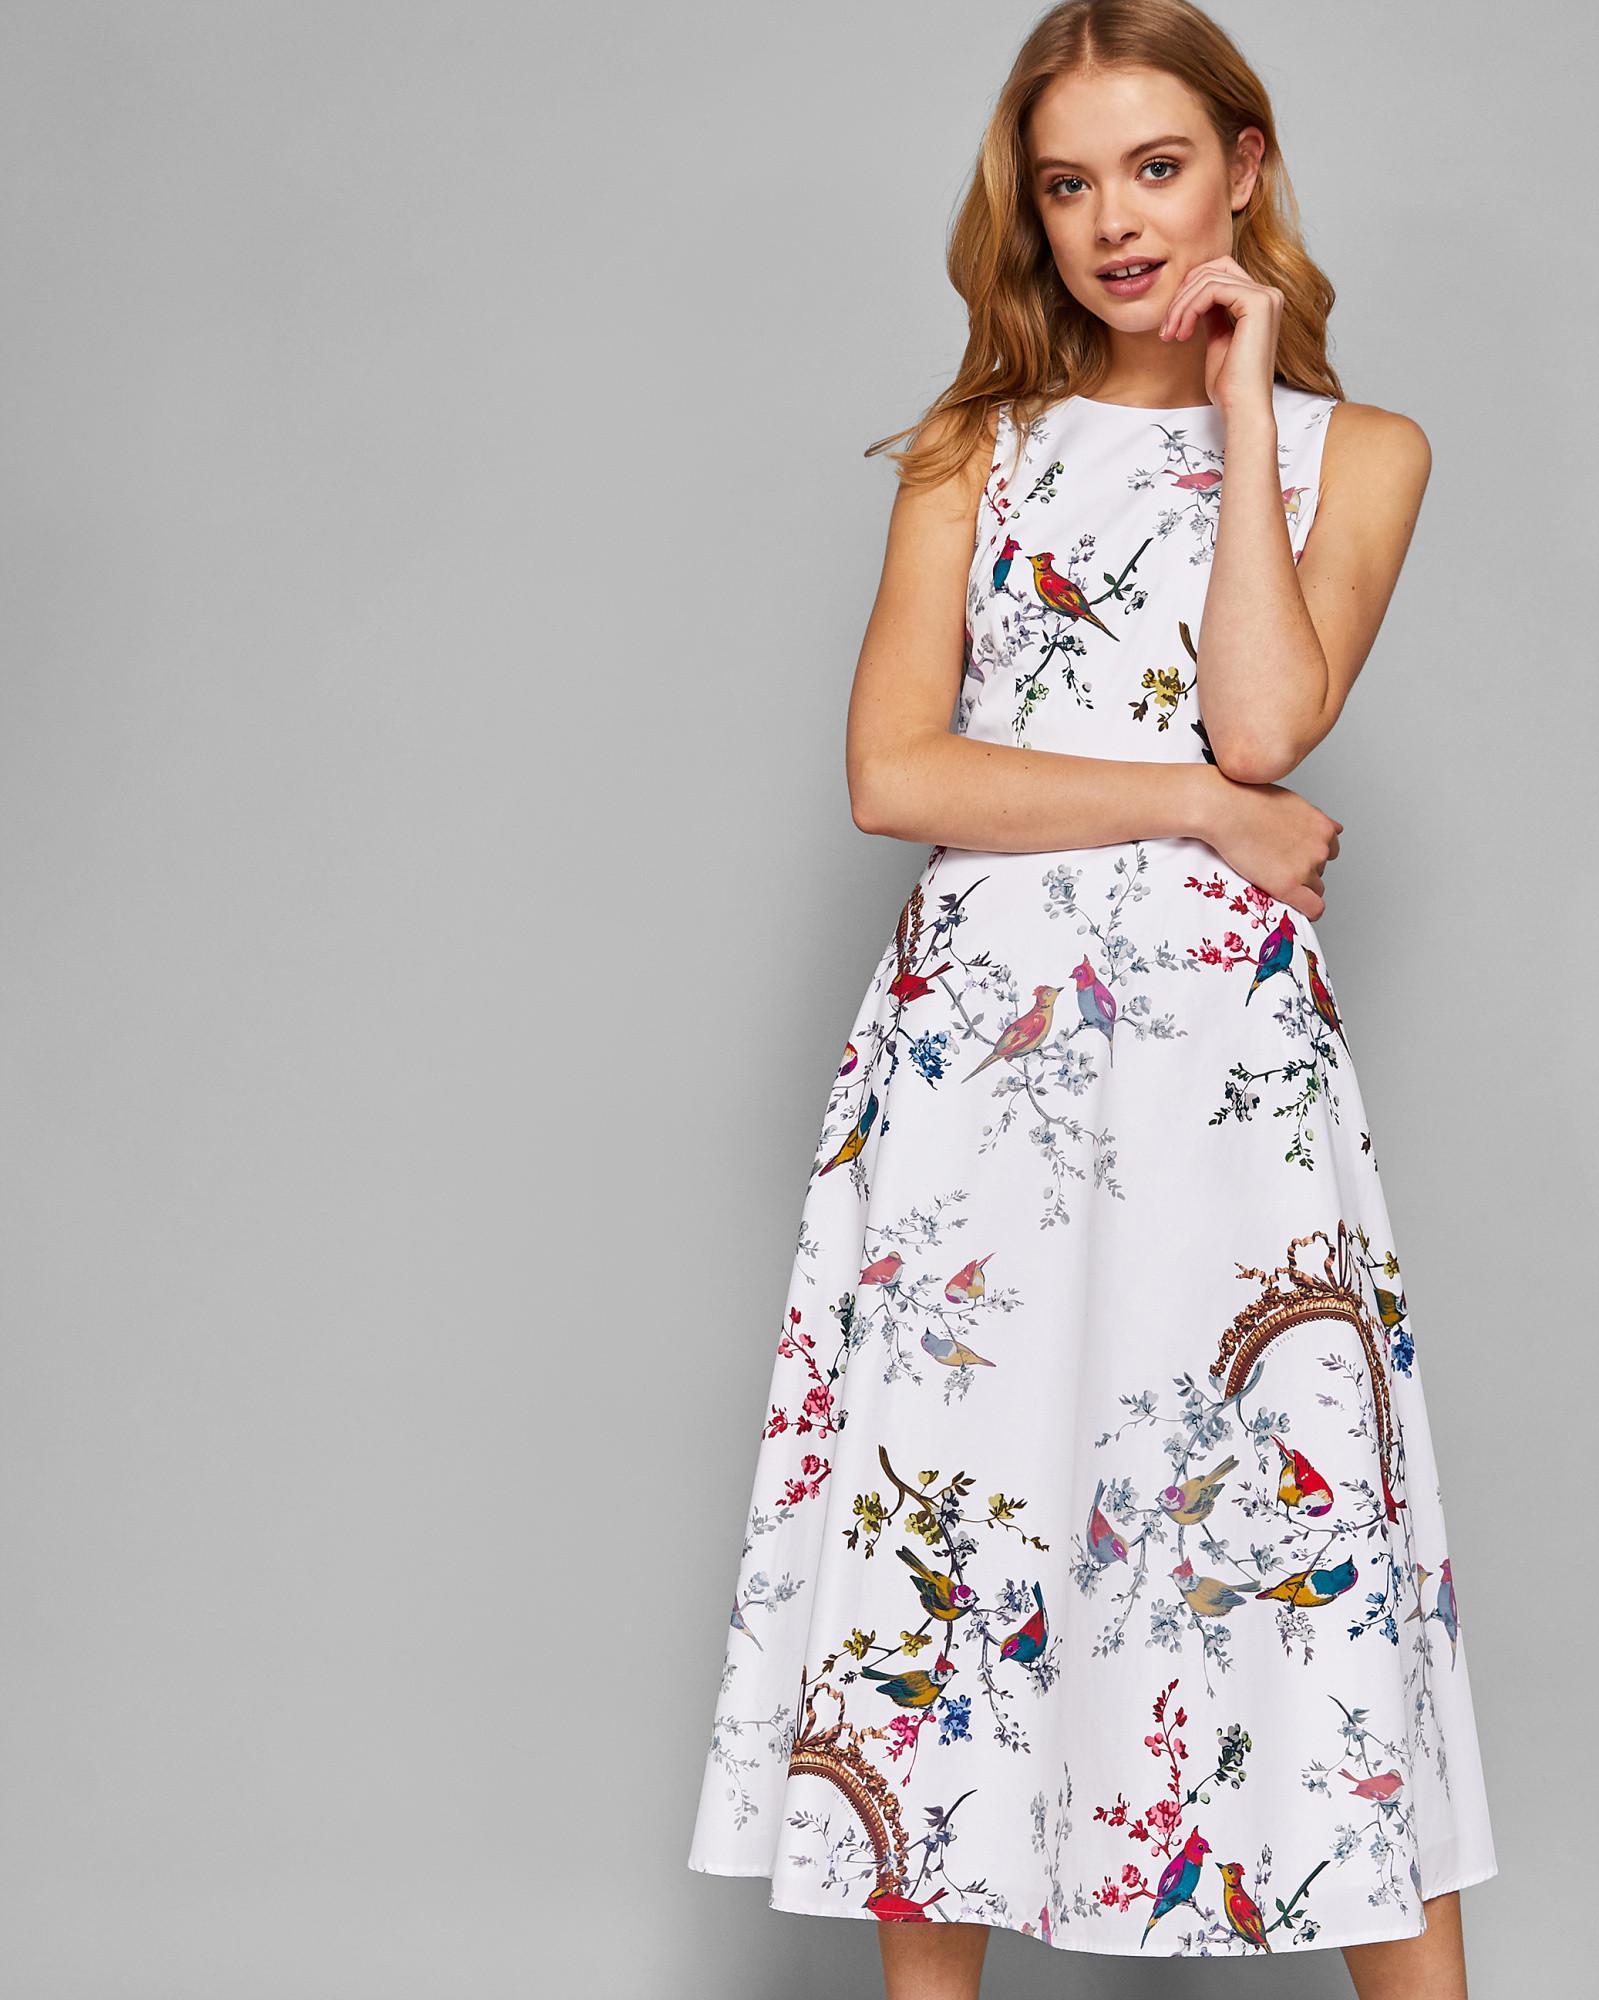 45e5a518232 Ted Baker Opulent Fauna Midi Dress in Natural - Lyst